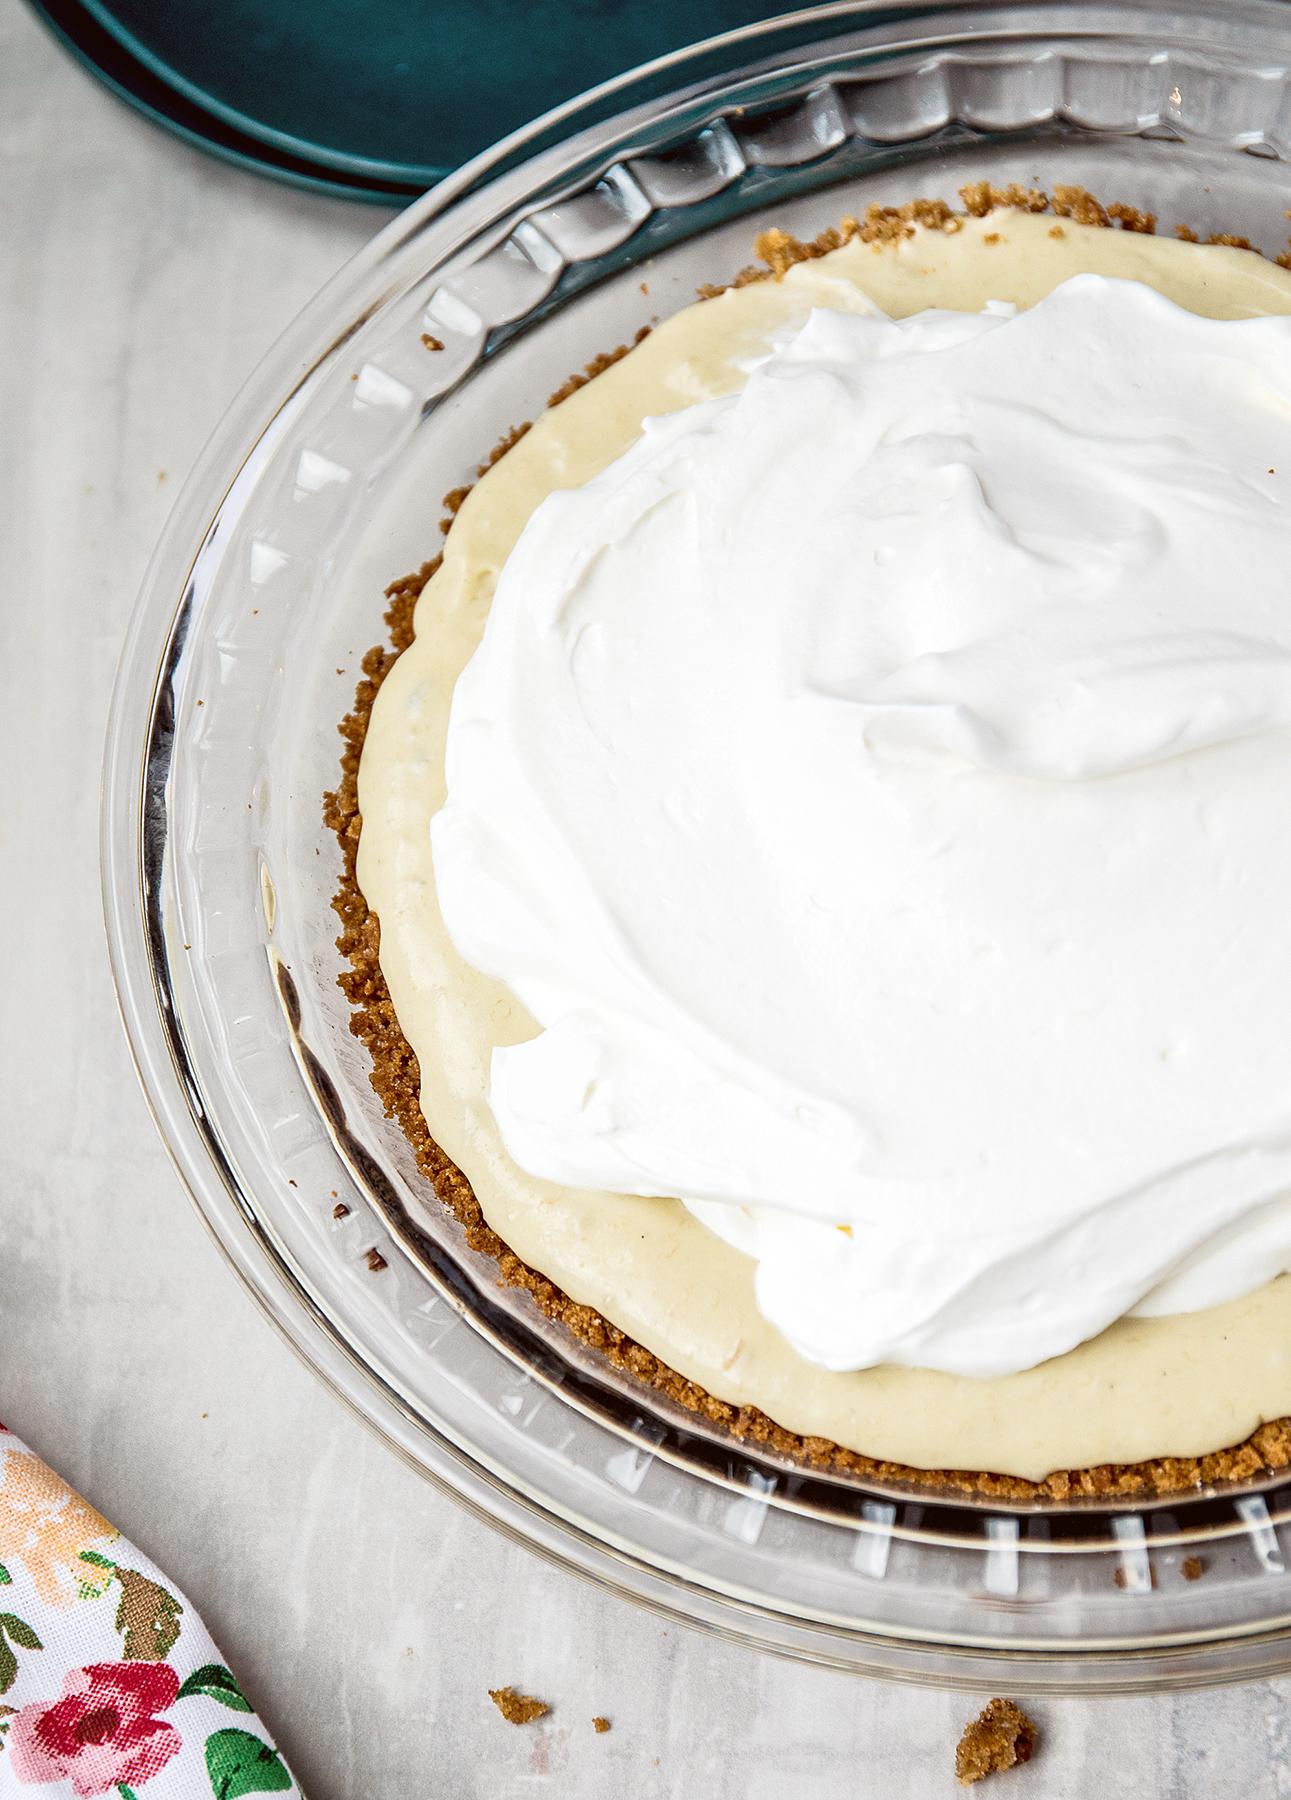 Stephanie Izard Pi Day Banana Cream Pie